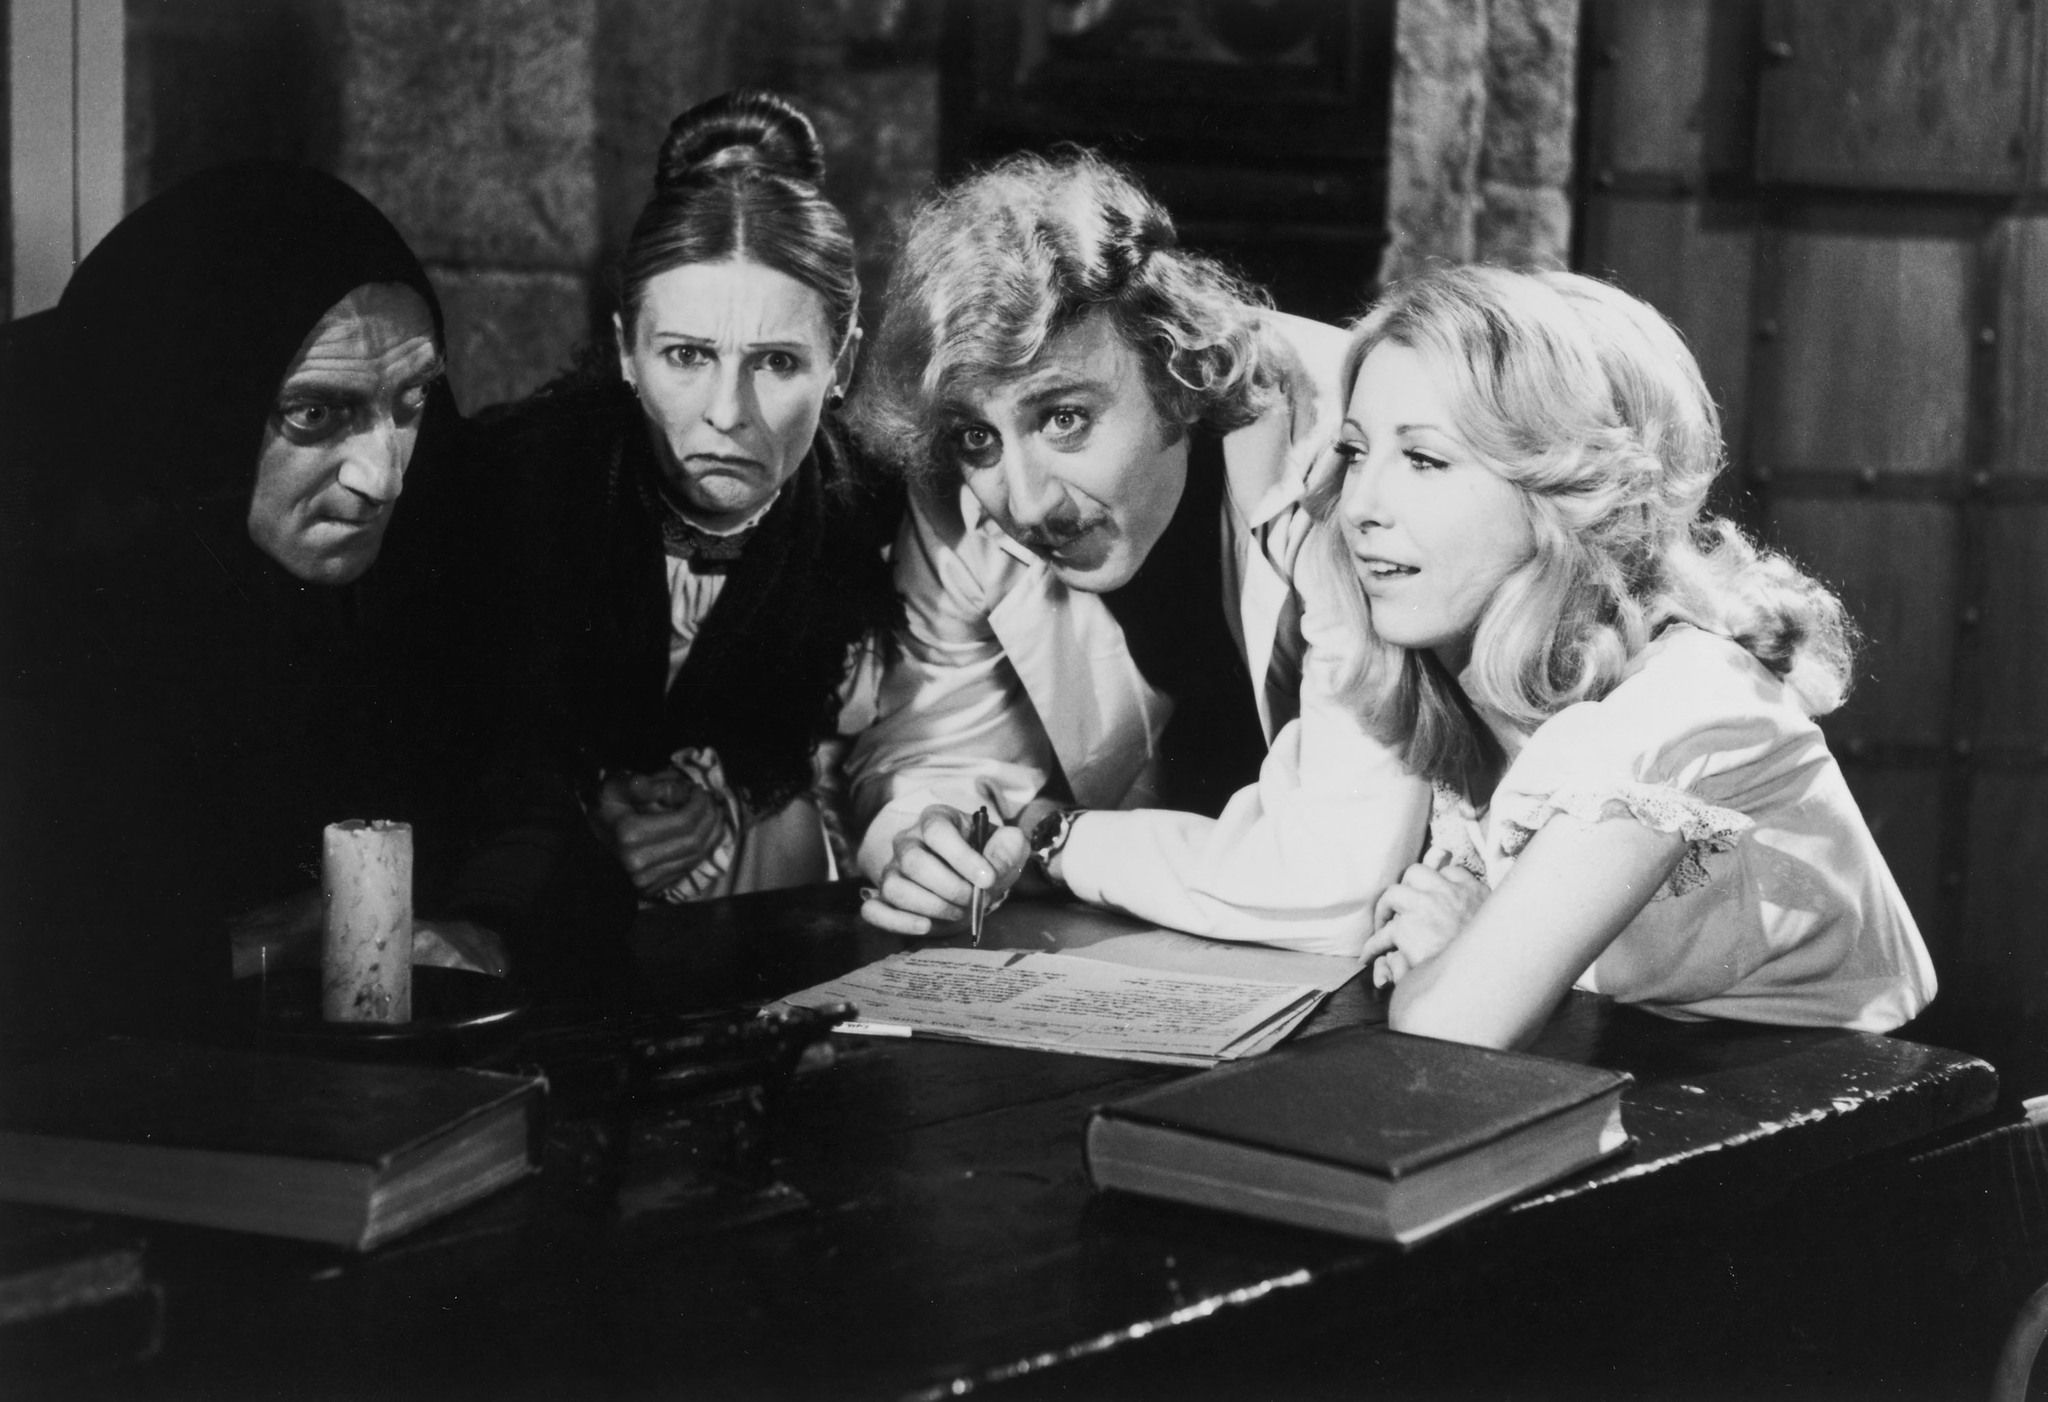 Teri Garr, Gene Wilder, Marty Feldman and Cloris Leachman